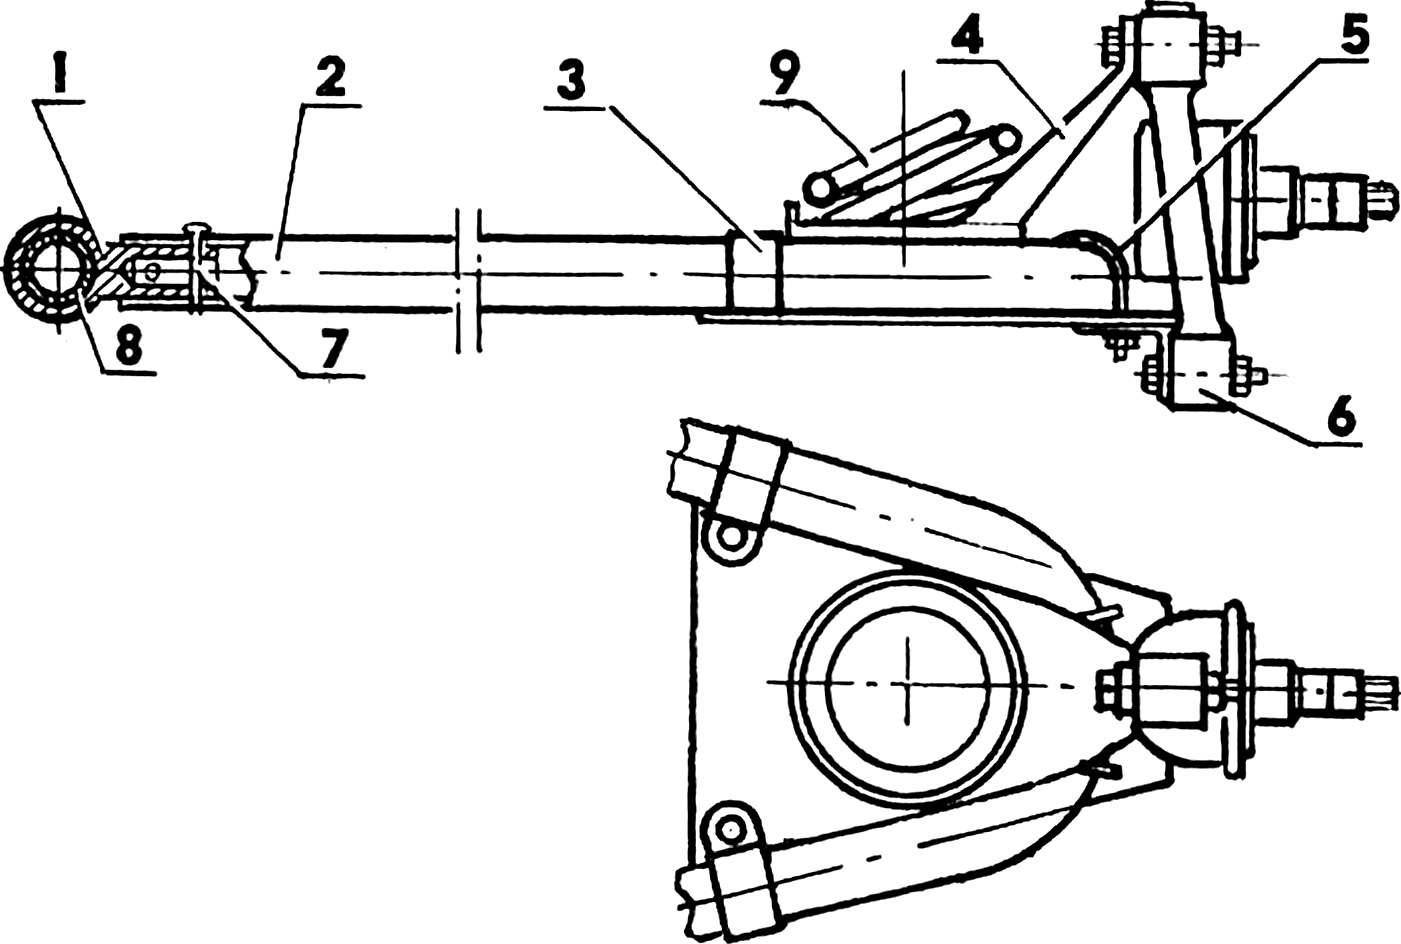 Transverse single-lever front suspension.